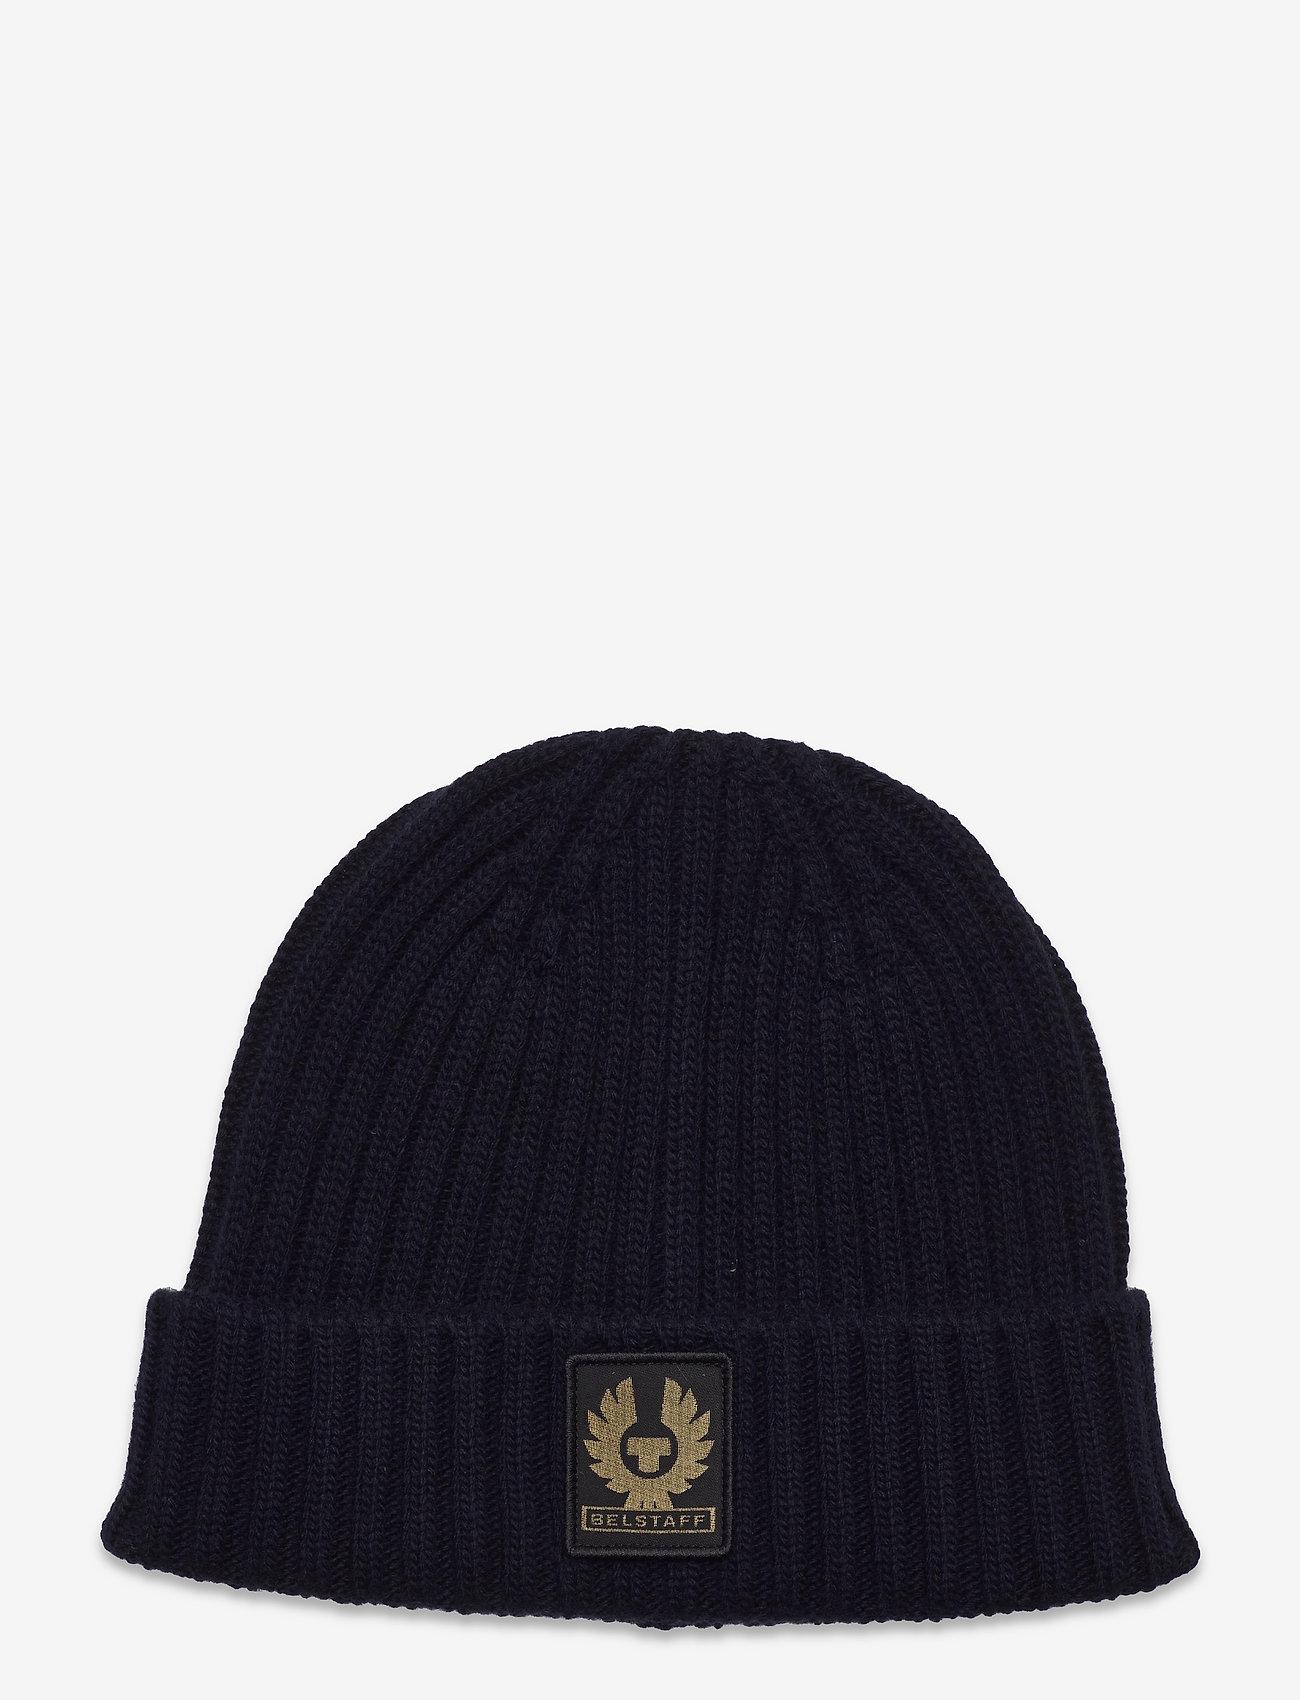 Belstaff - WATCH HAT W/PATCH - bonnets & casquettes - dark navy - 0